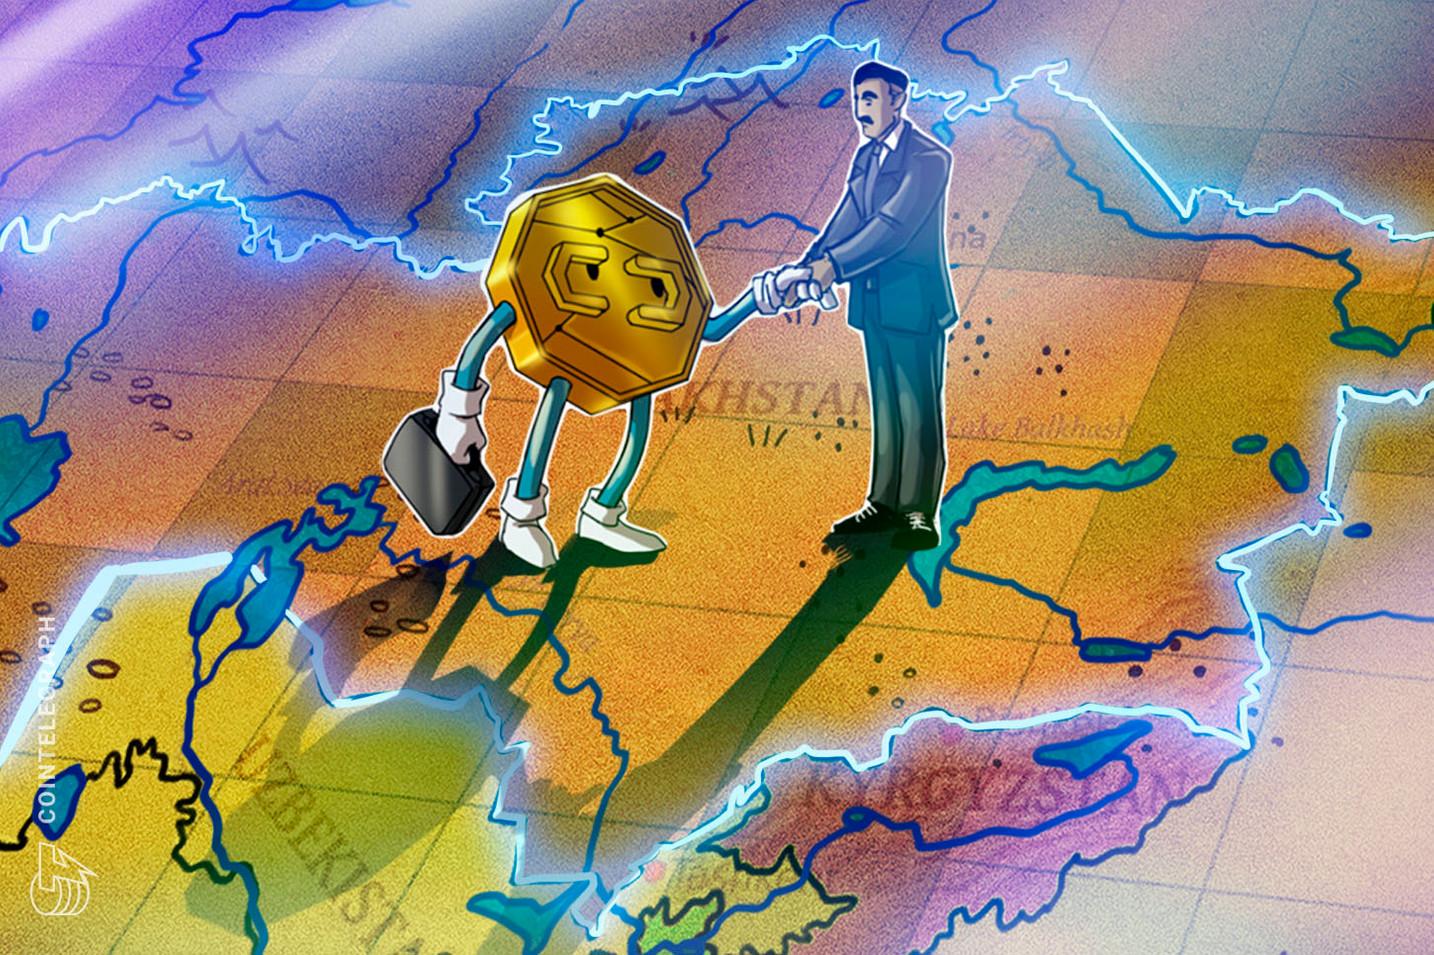 1434 aHR0cHM6Ly9zMy5jb2ludGVsZWdyYXBoLmNvbS91cGxvYWRzLzIwMjEtMDcvNmQ4NjQzZTItODY0Ny00N2VmLWI4NTktZTNkNDIwMzk5YmI4LmpwZw - گفته می شود قزاقستان به بانک ها اجازه می دهد تا خریدهای رمزارزی را پردازش کنند